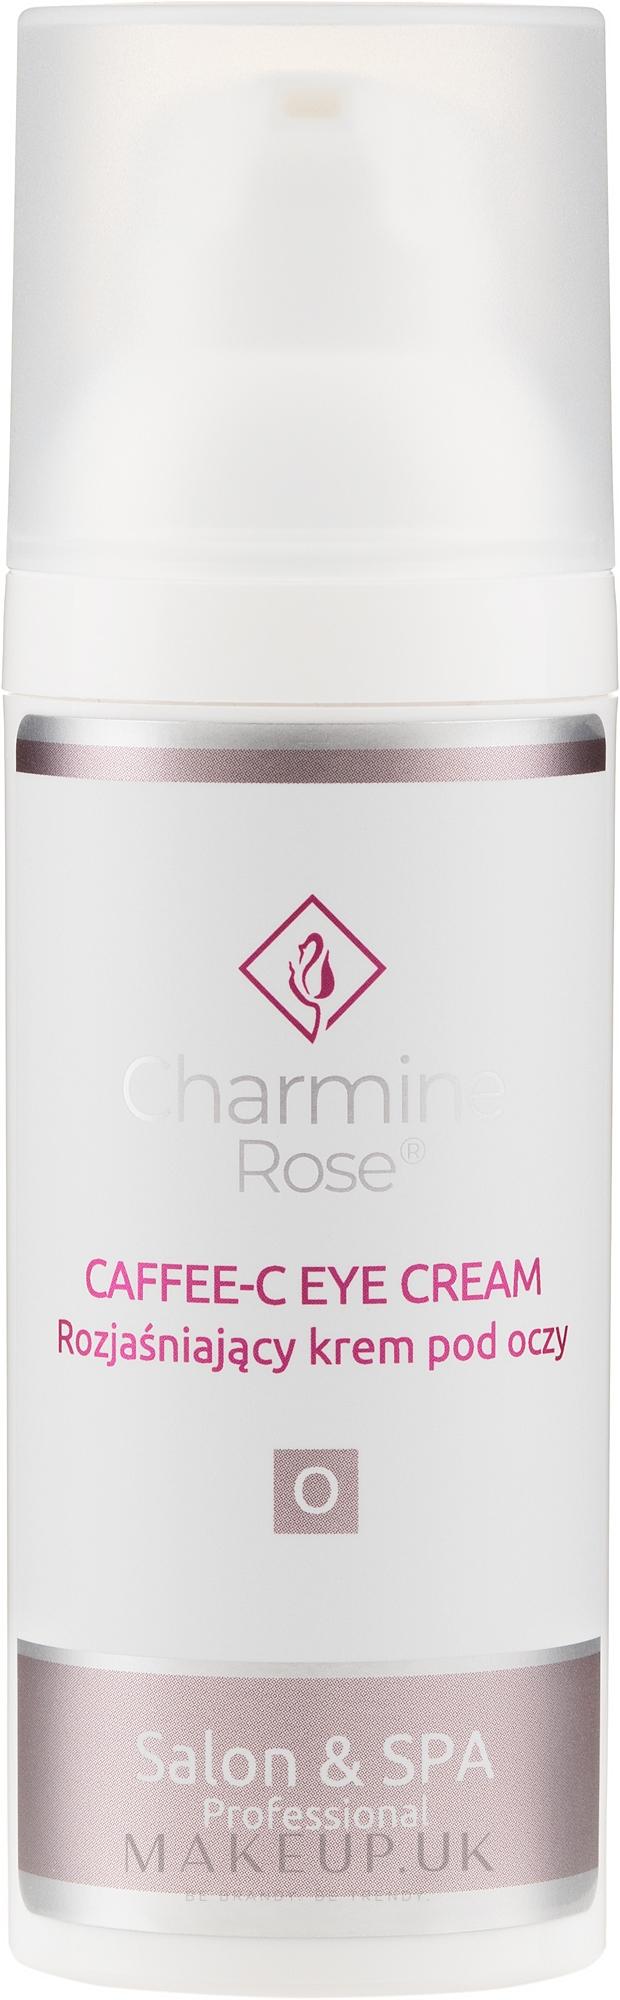 Brightening Eye Cream - Charmine Rose Caffee-C Eye Cream — photo 50 ml